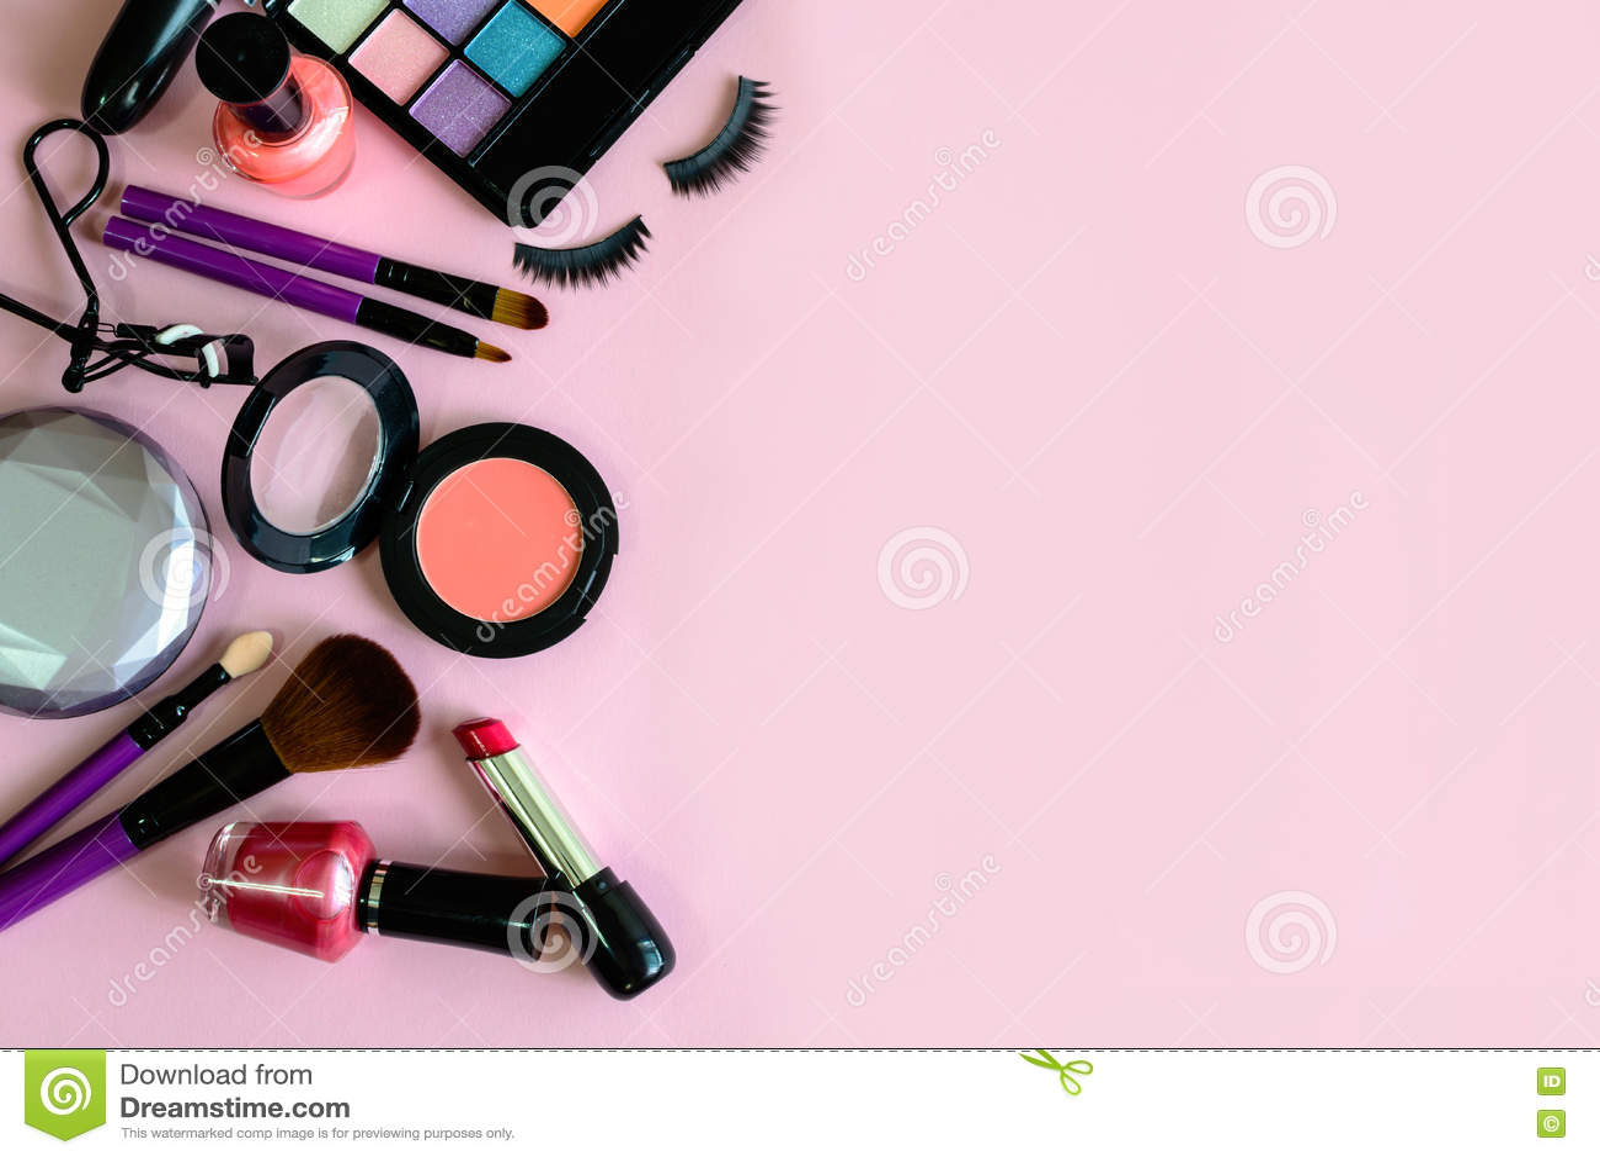 Картинки про макияж про моду